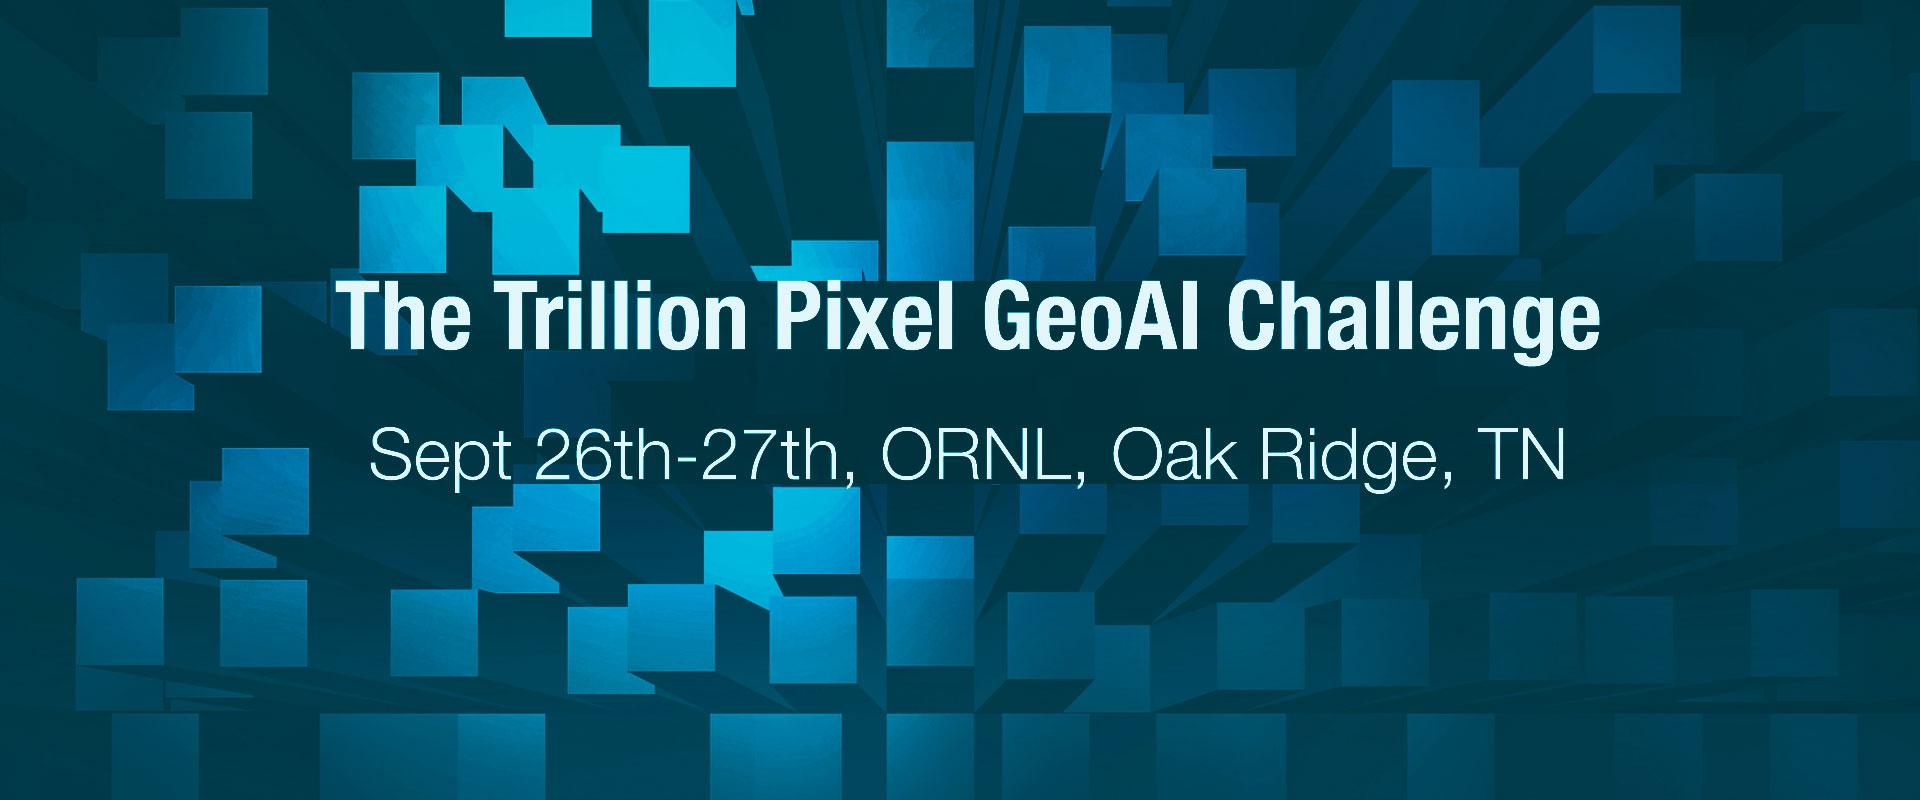 Trillion pixel challenge